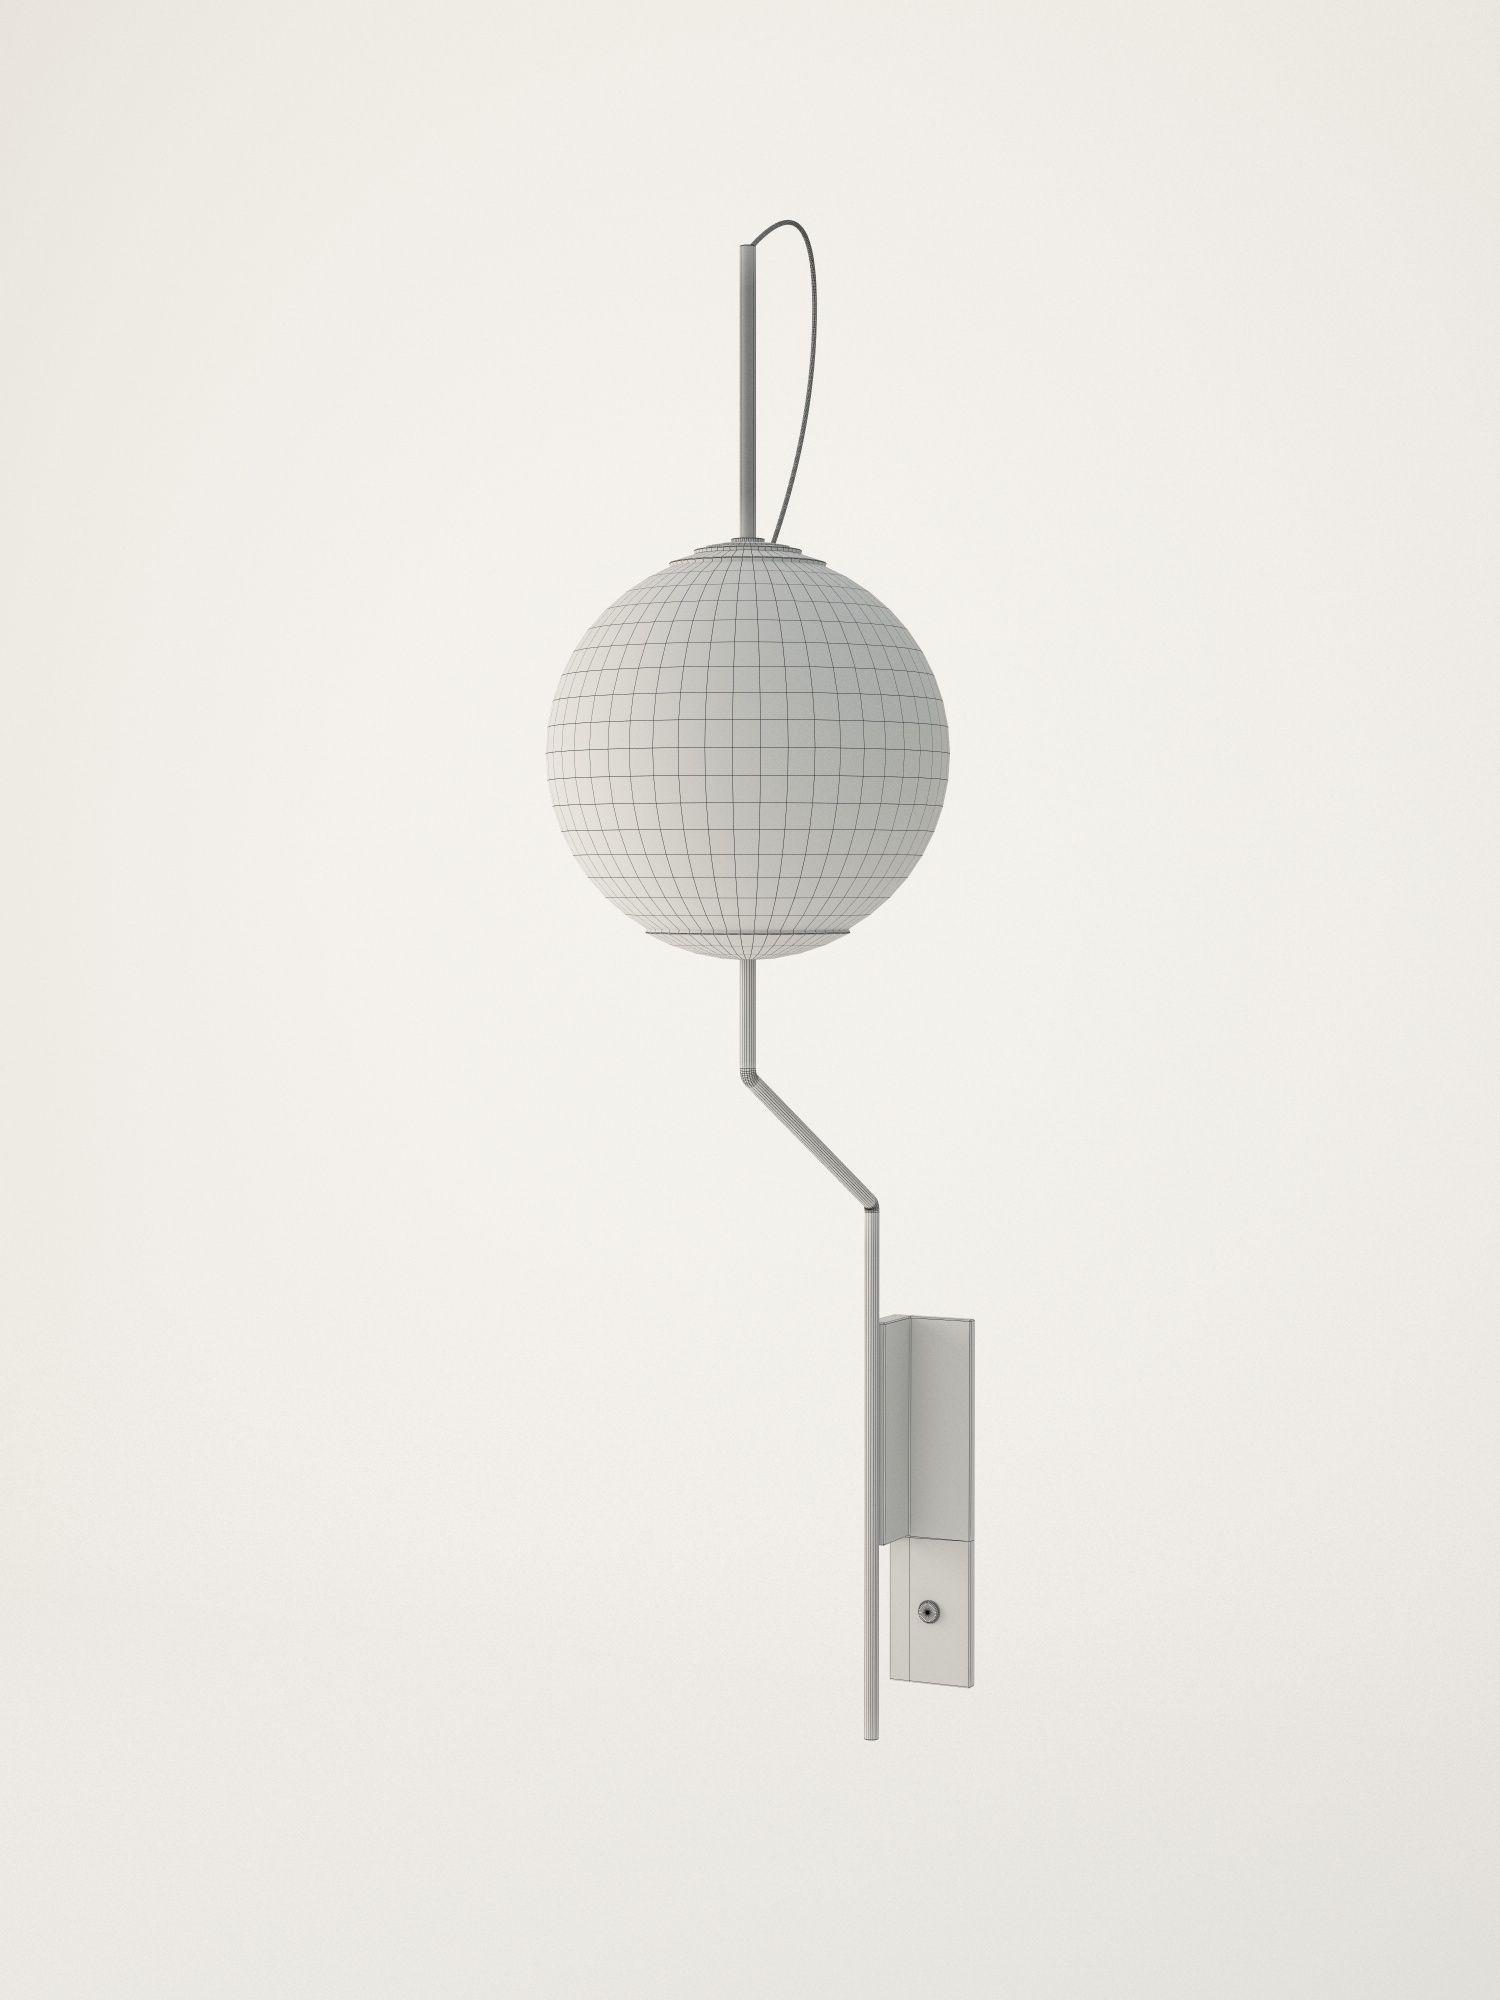 Wall Lamps 3d Model : Brass Wall Lamp 3D Model OBJ 3DS FBX C4D CGTrader.com